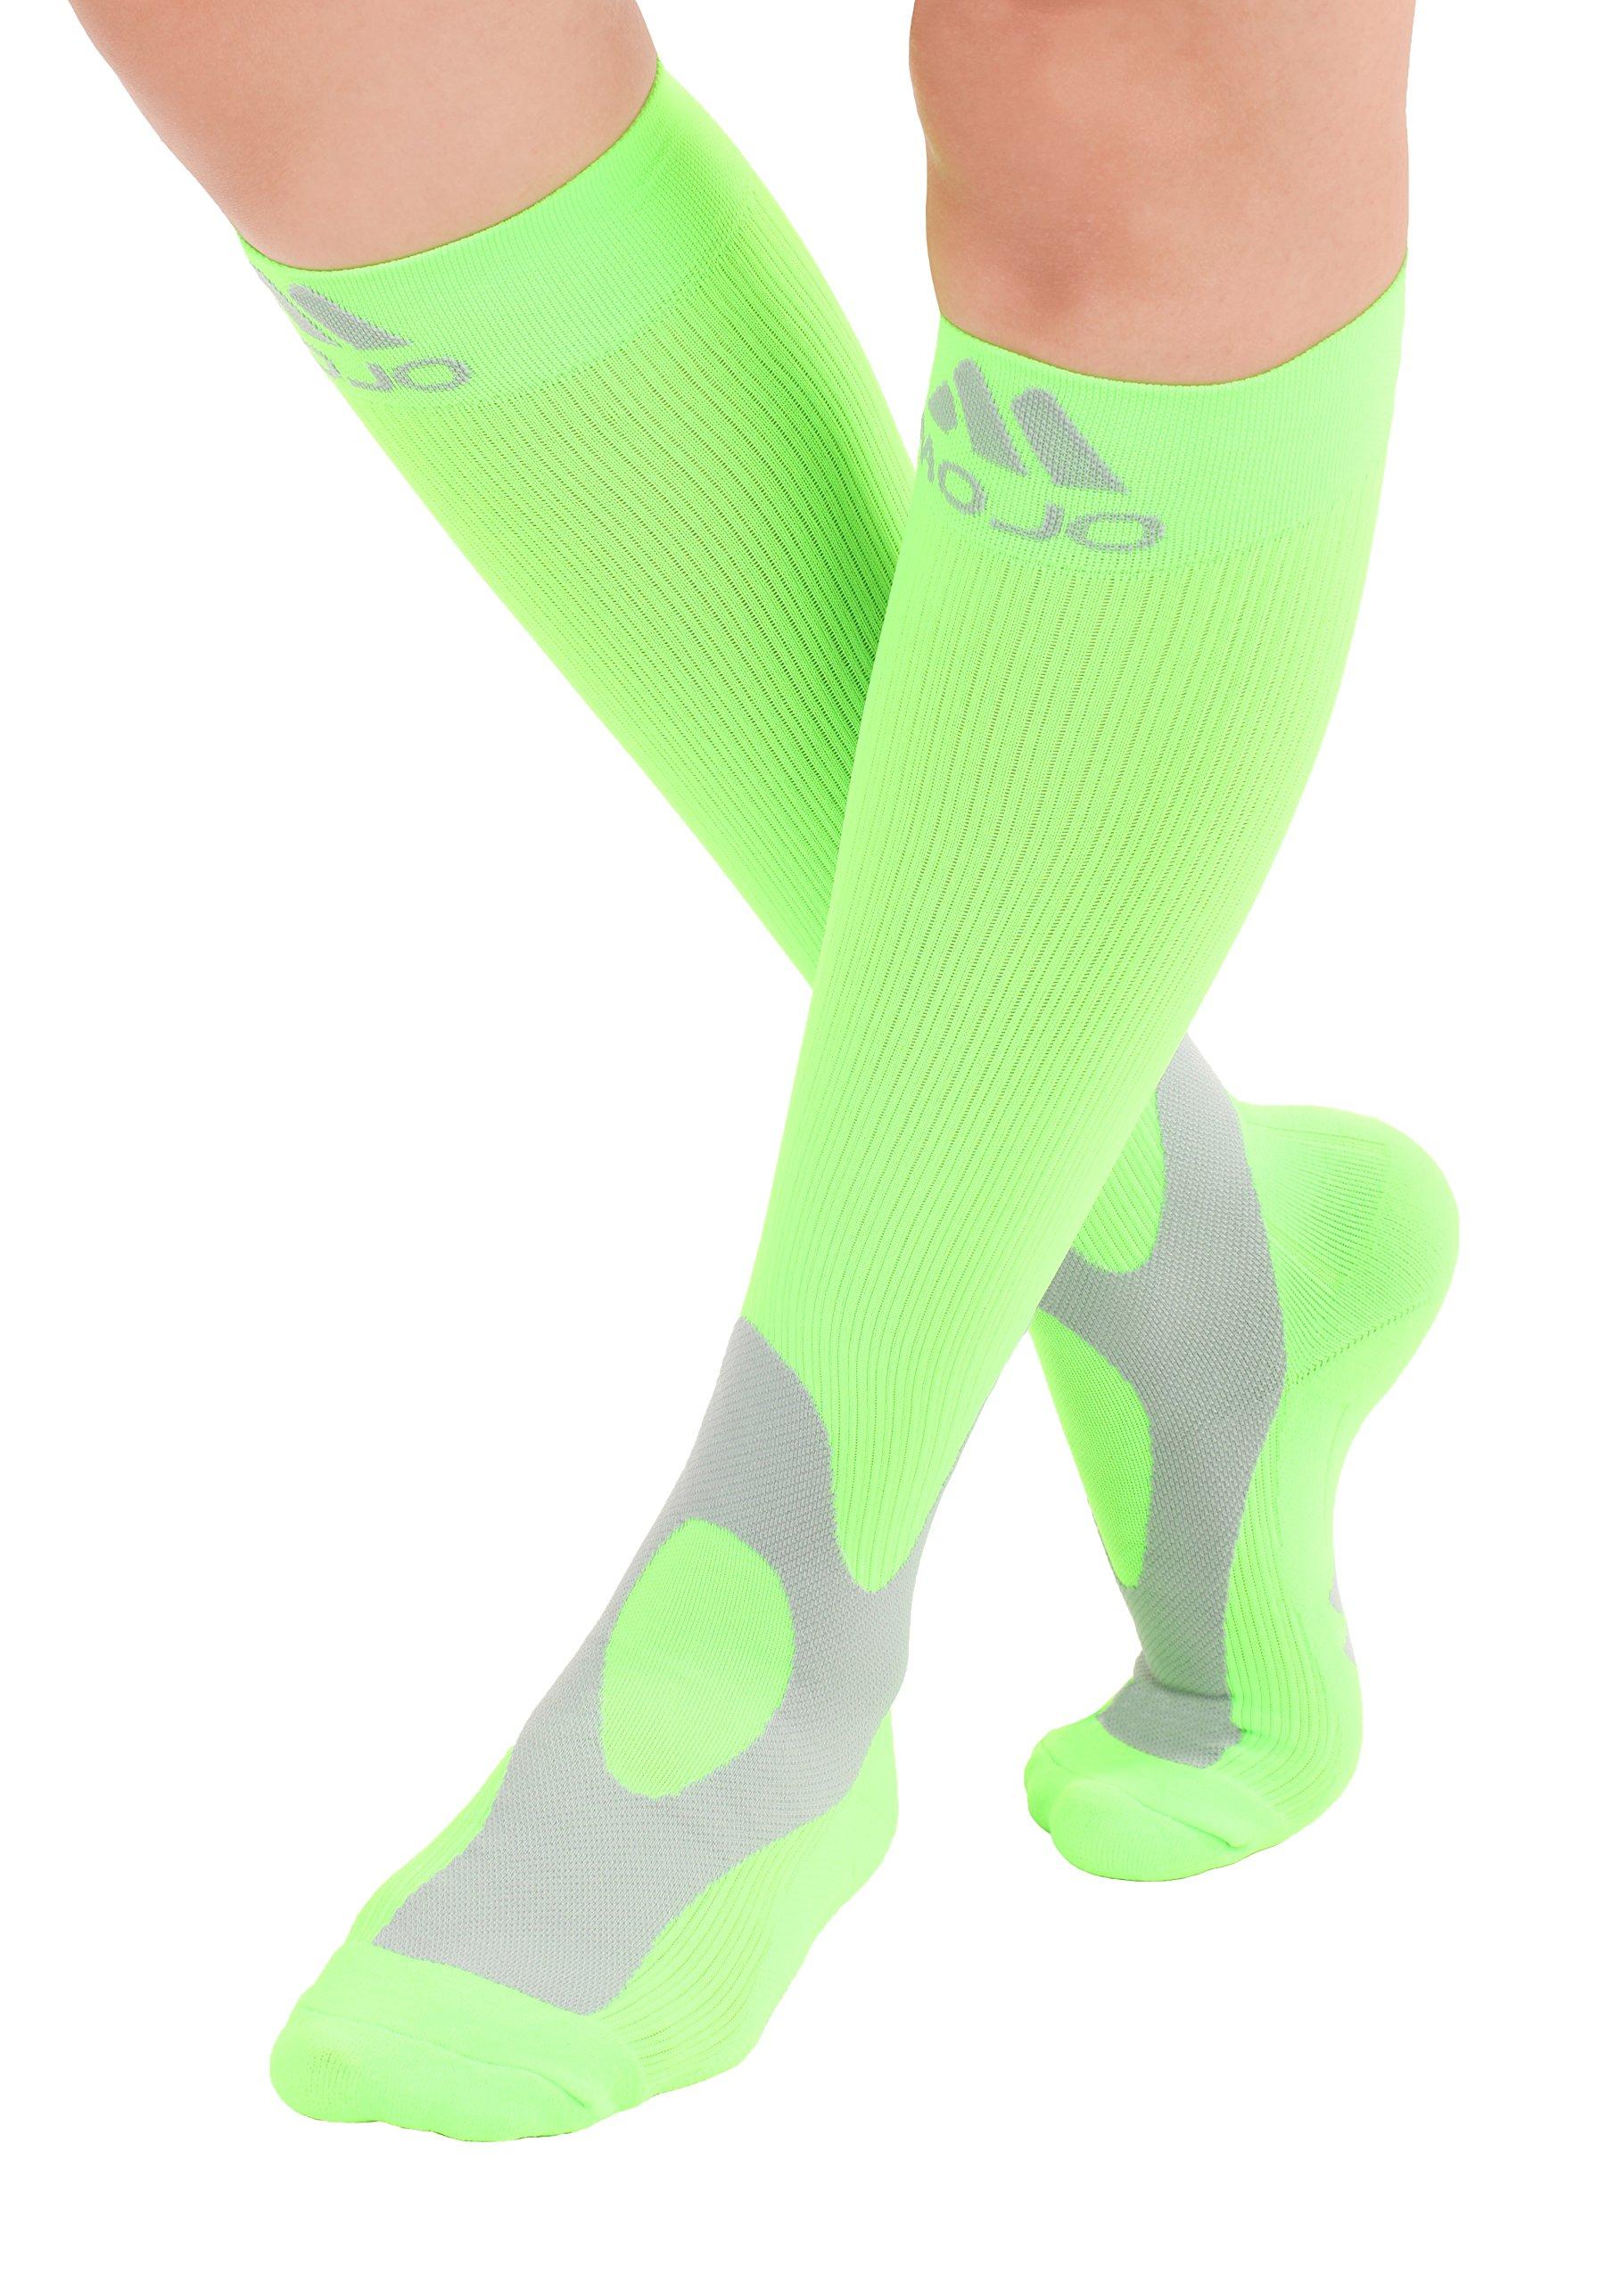 2b6148dabe Amazon.com: XXL Mojo Neon Green Compression Socks 20-30mmHg - Extra ...